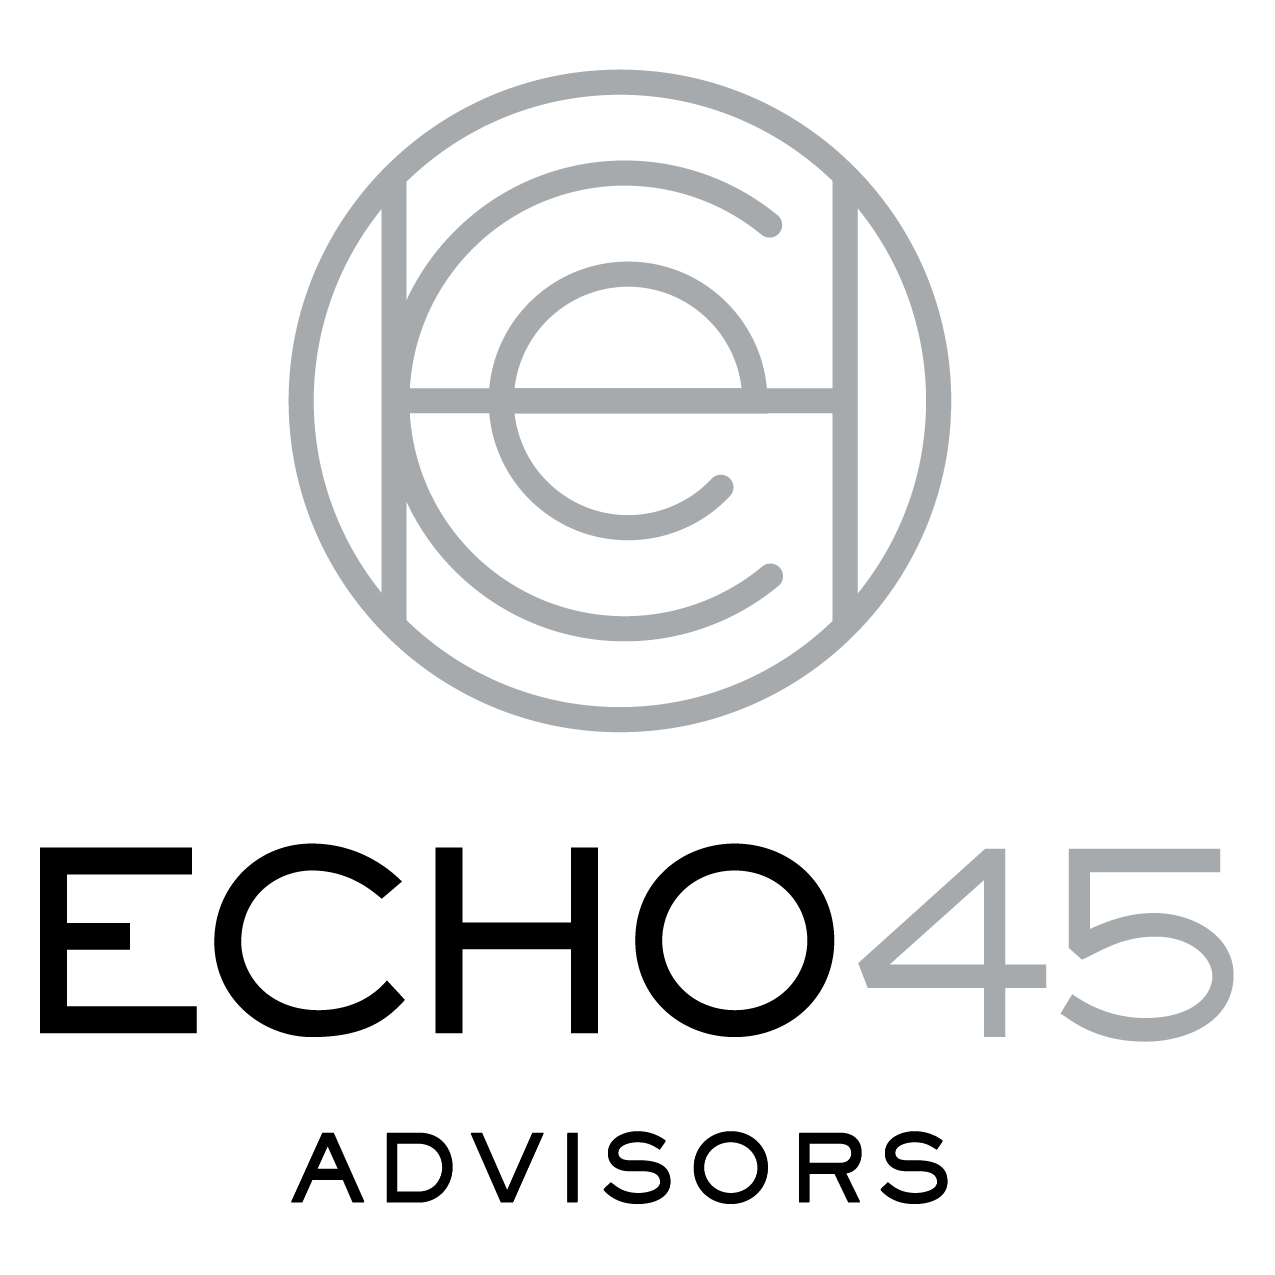 Echo45 Advisors